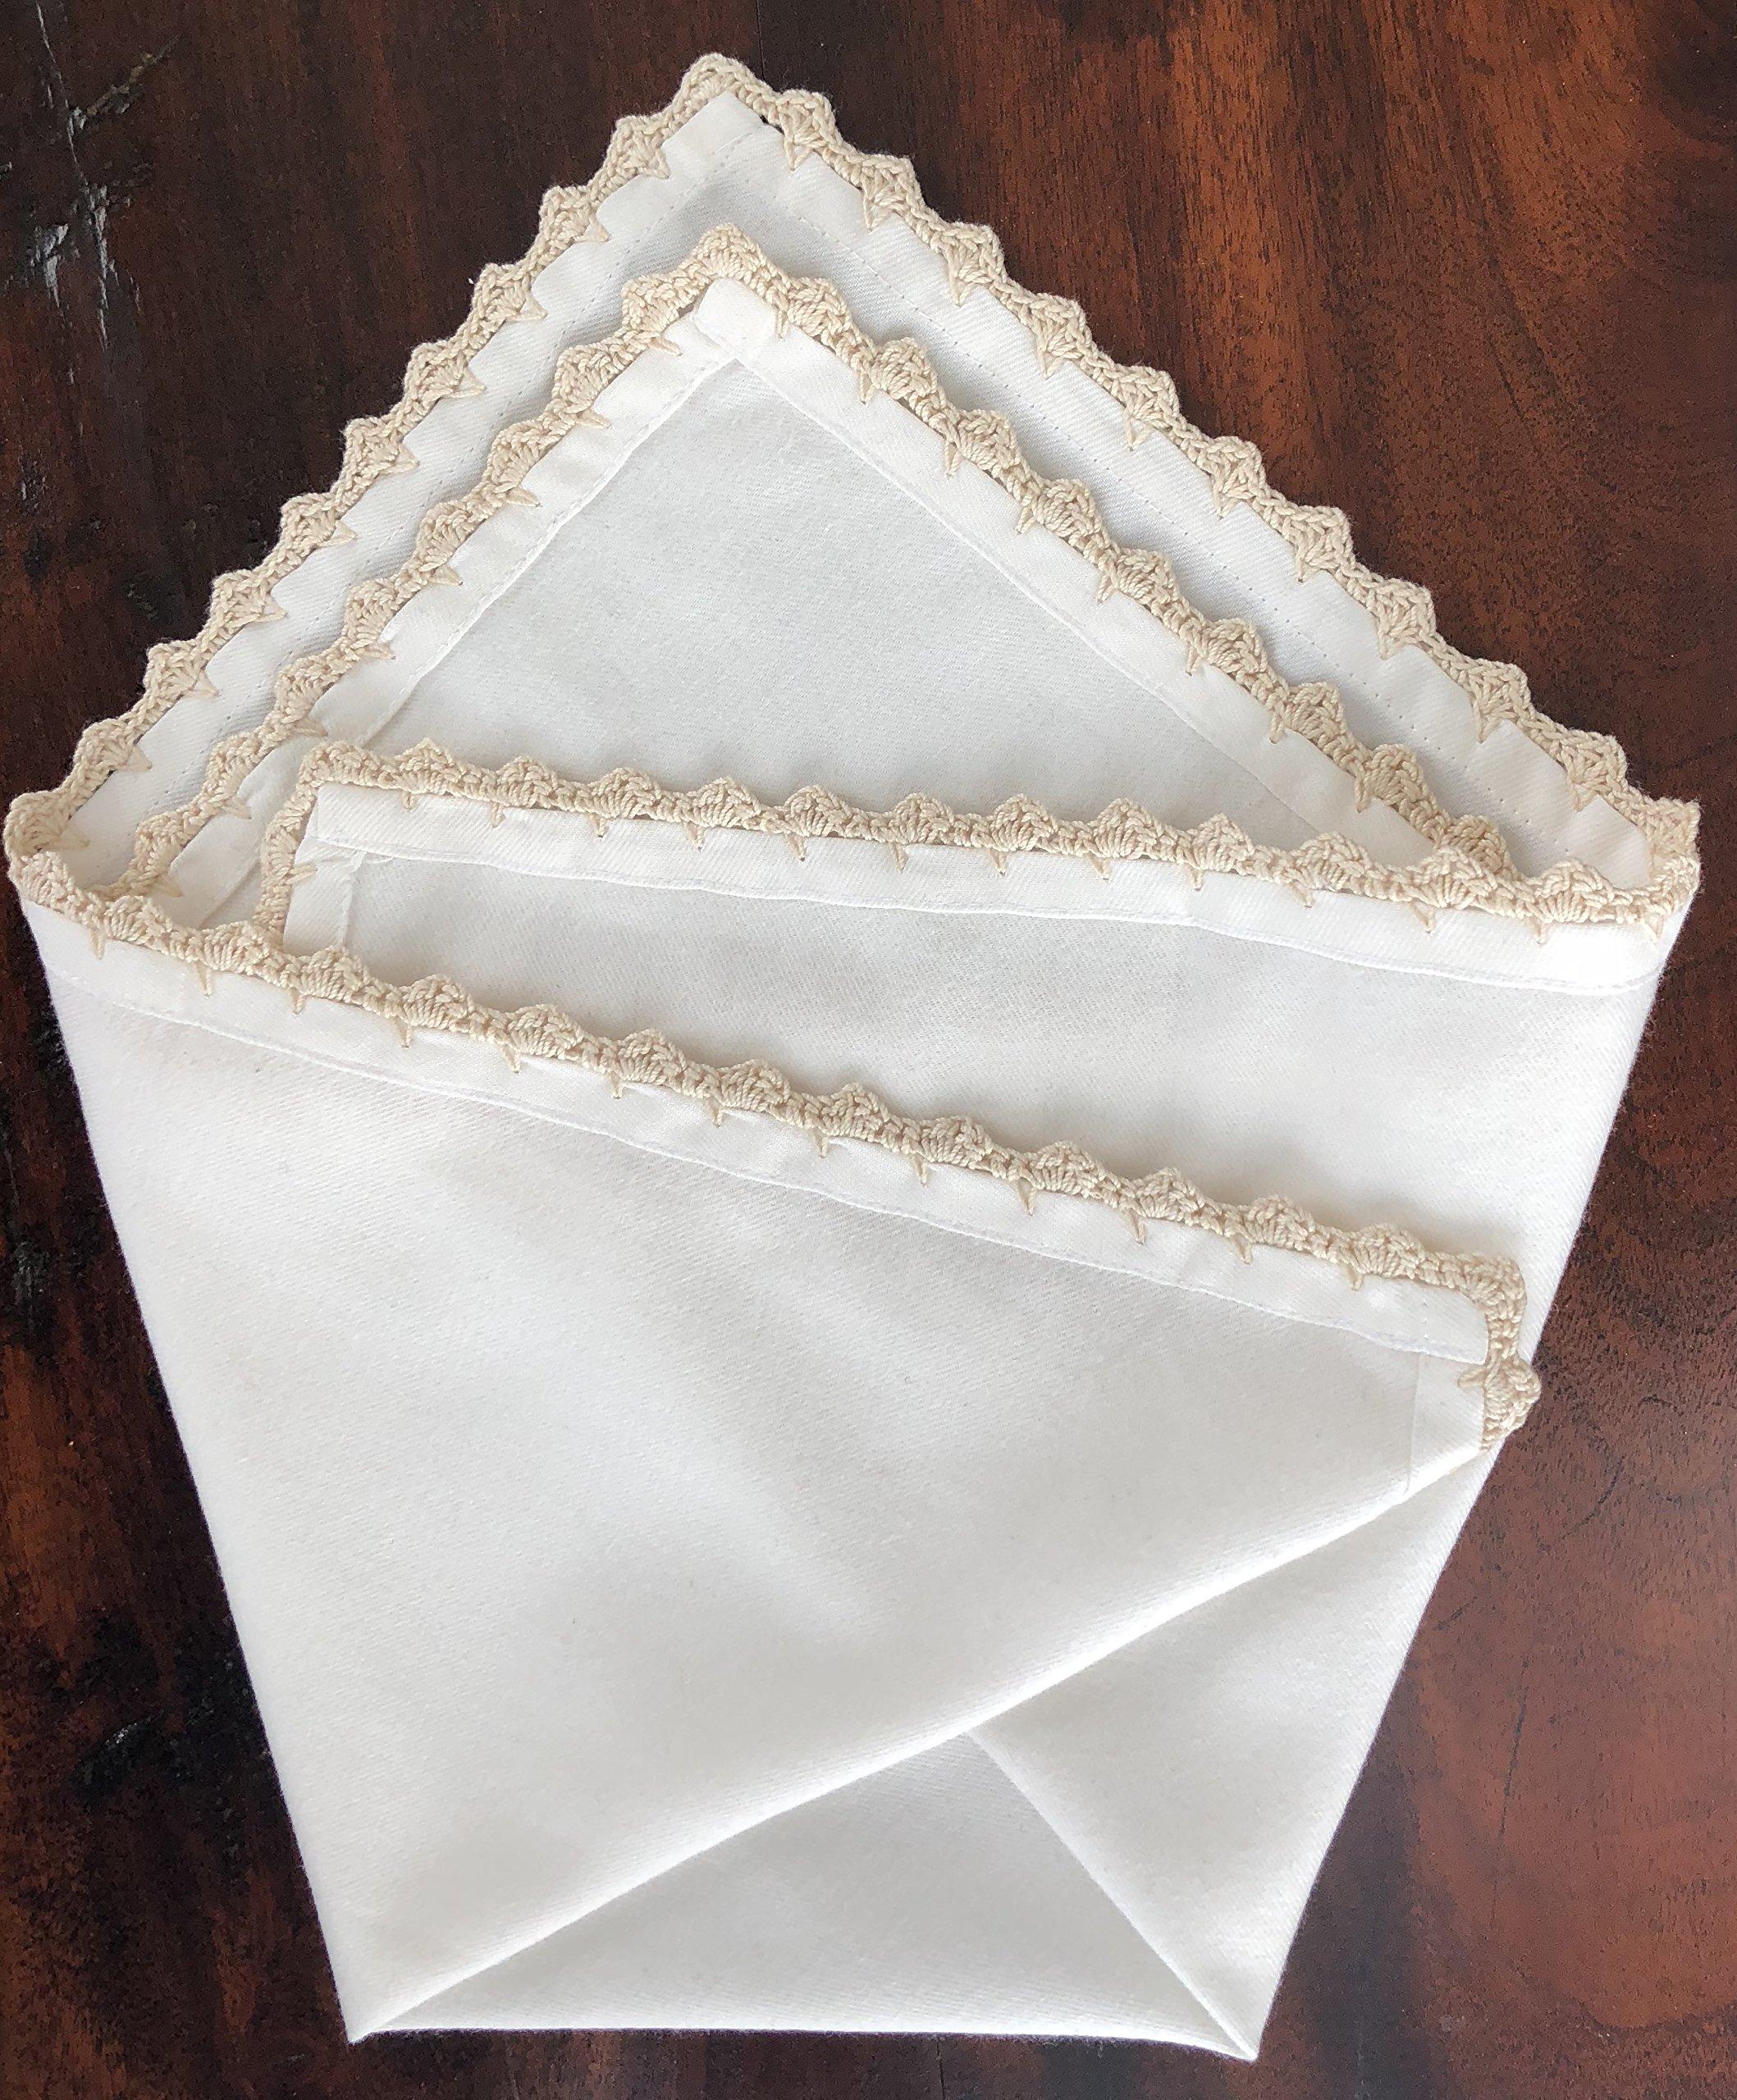 MoLi 100% Egyptian Cotton Cloth Dinner Napkins Hand Crocheted - Set of 6 Pack Lunch Linen - Elegant Decorative Fabric Handmade Table Linens - Servilletas de Tela Wedding Napkin (White) by MoLi (Image #9)